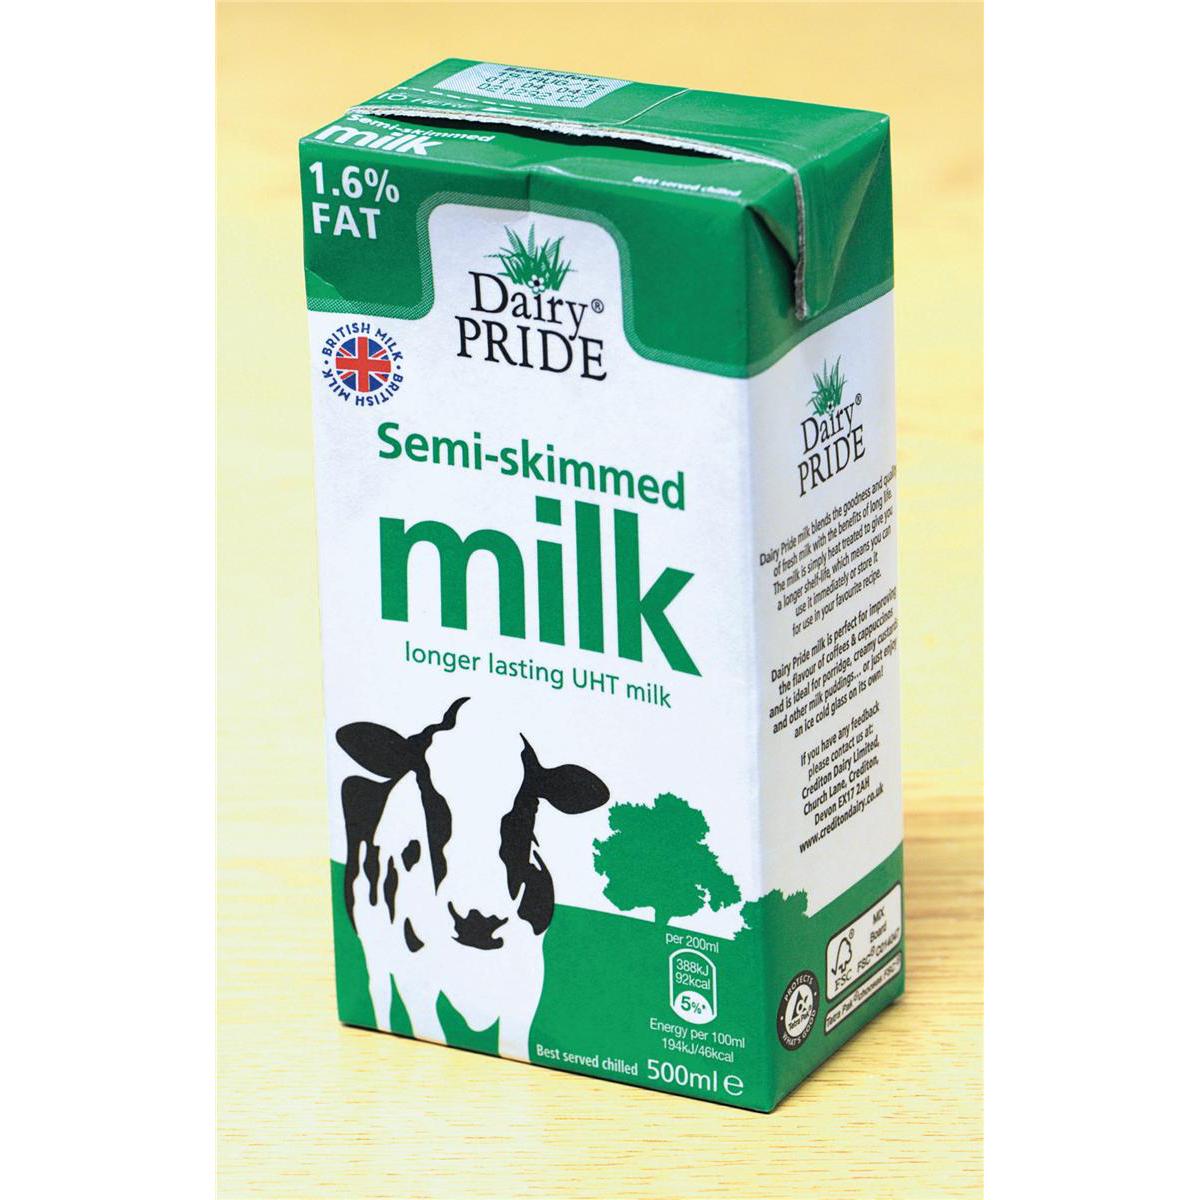 Dairy Pride Semi Skimmed Milk UHT 500ml Ref 0402058 Pack 12